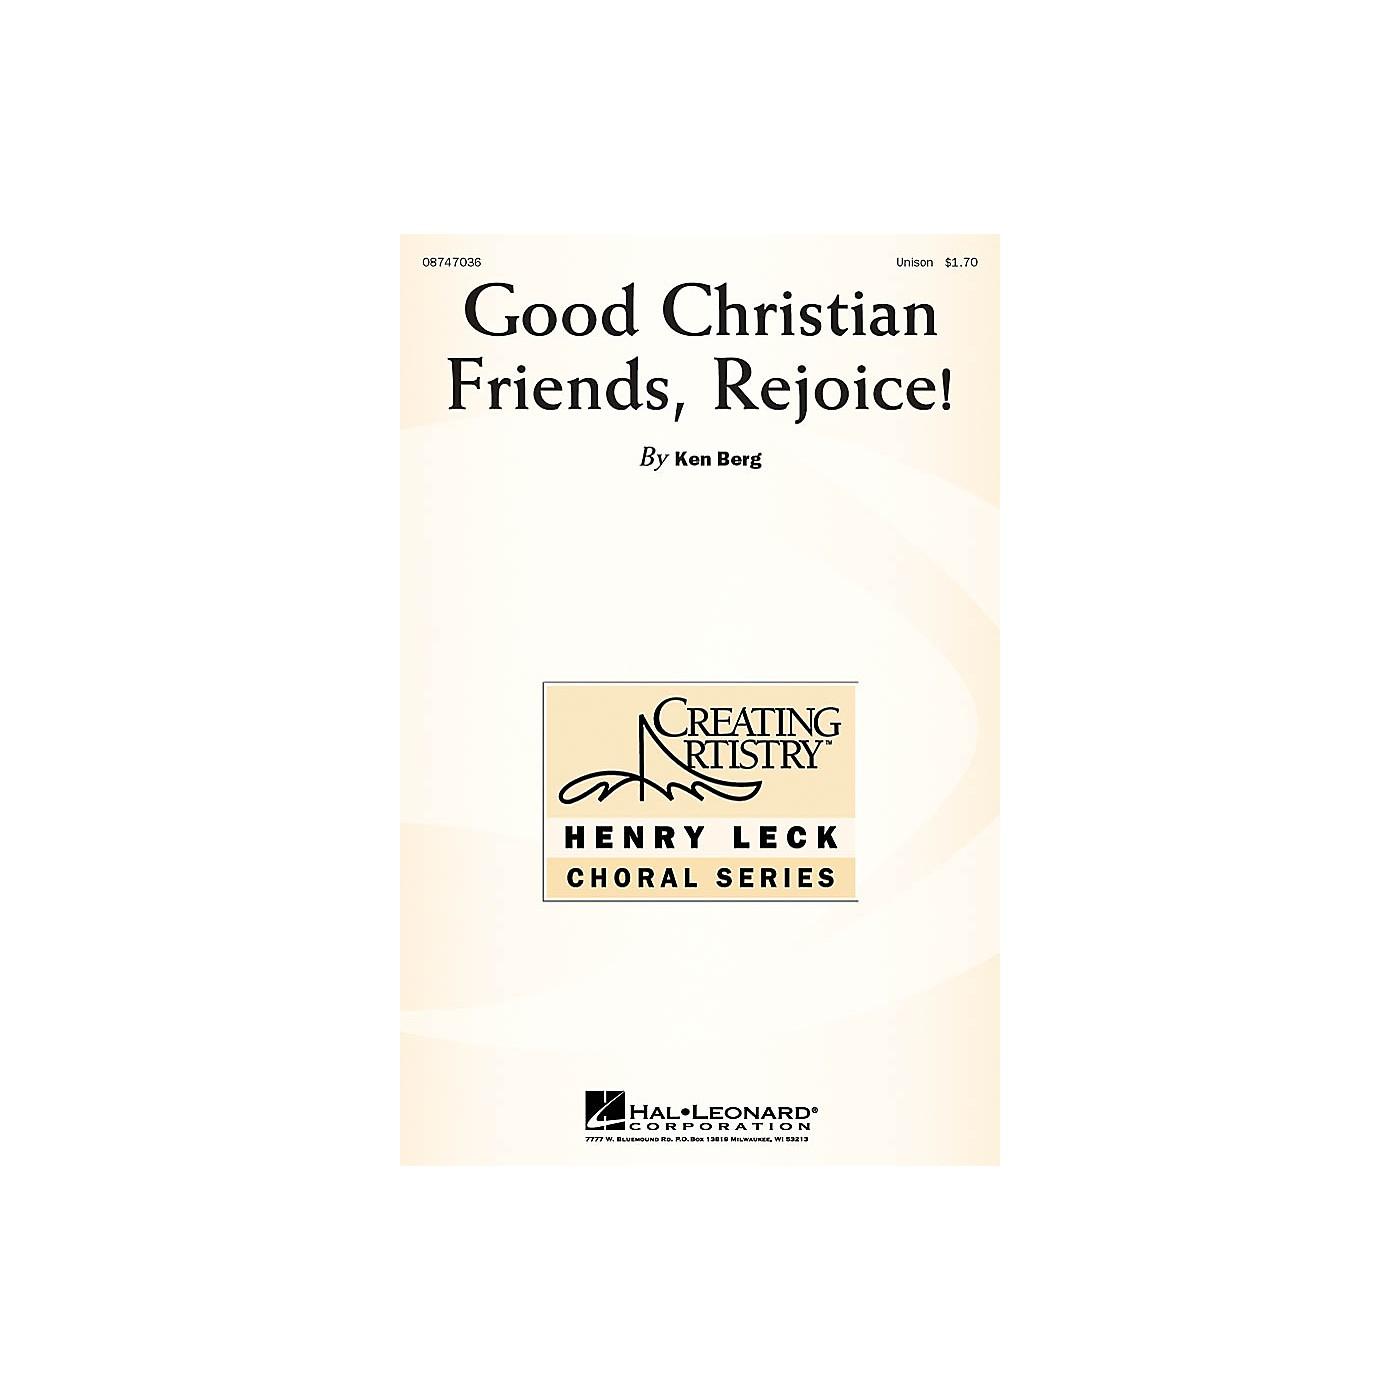 Hal Leonard Good Christian Friends, Rejoice! UNIS composed by Ken Berg thumbnail